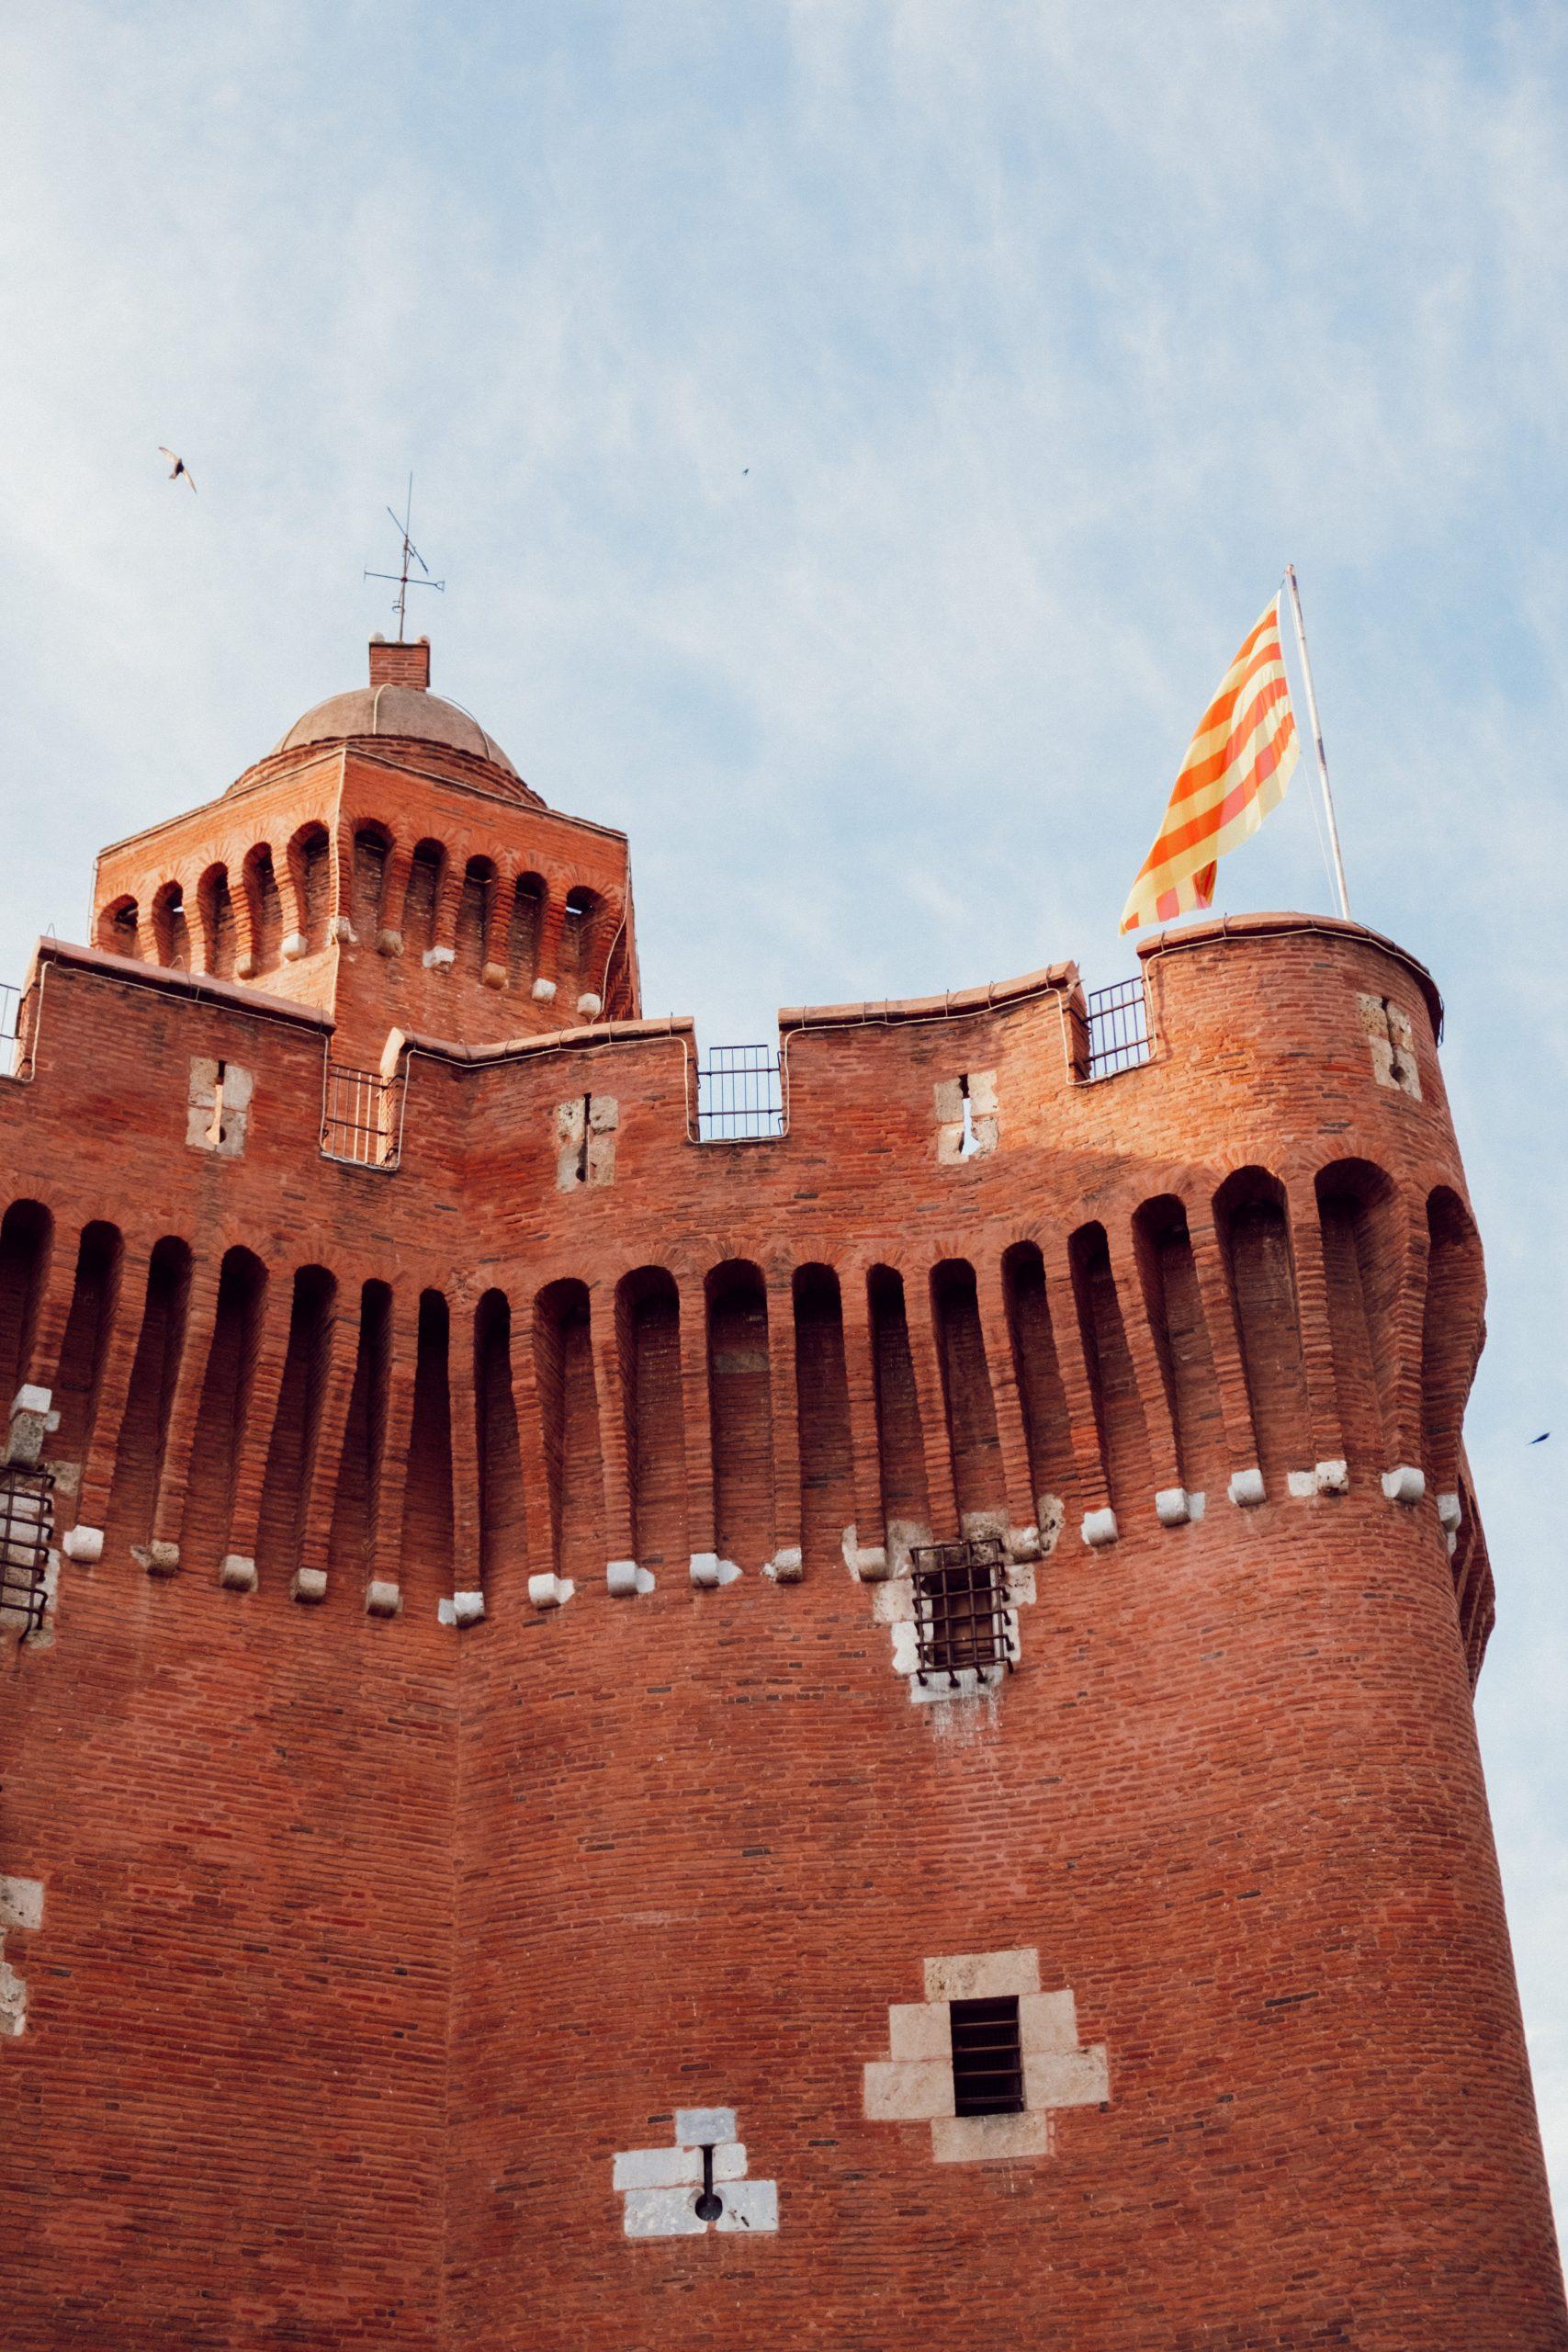 Le Castillet monument emblématique de Perpignan